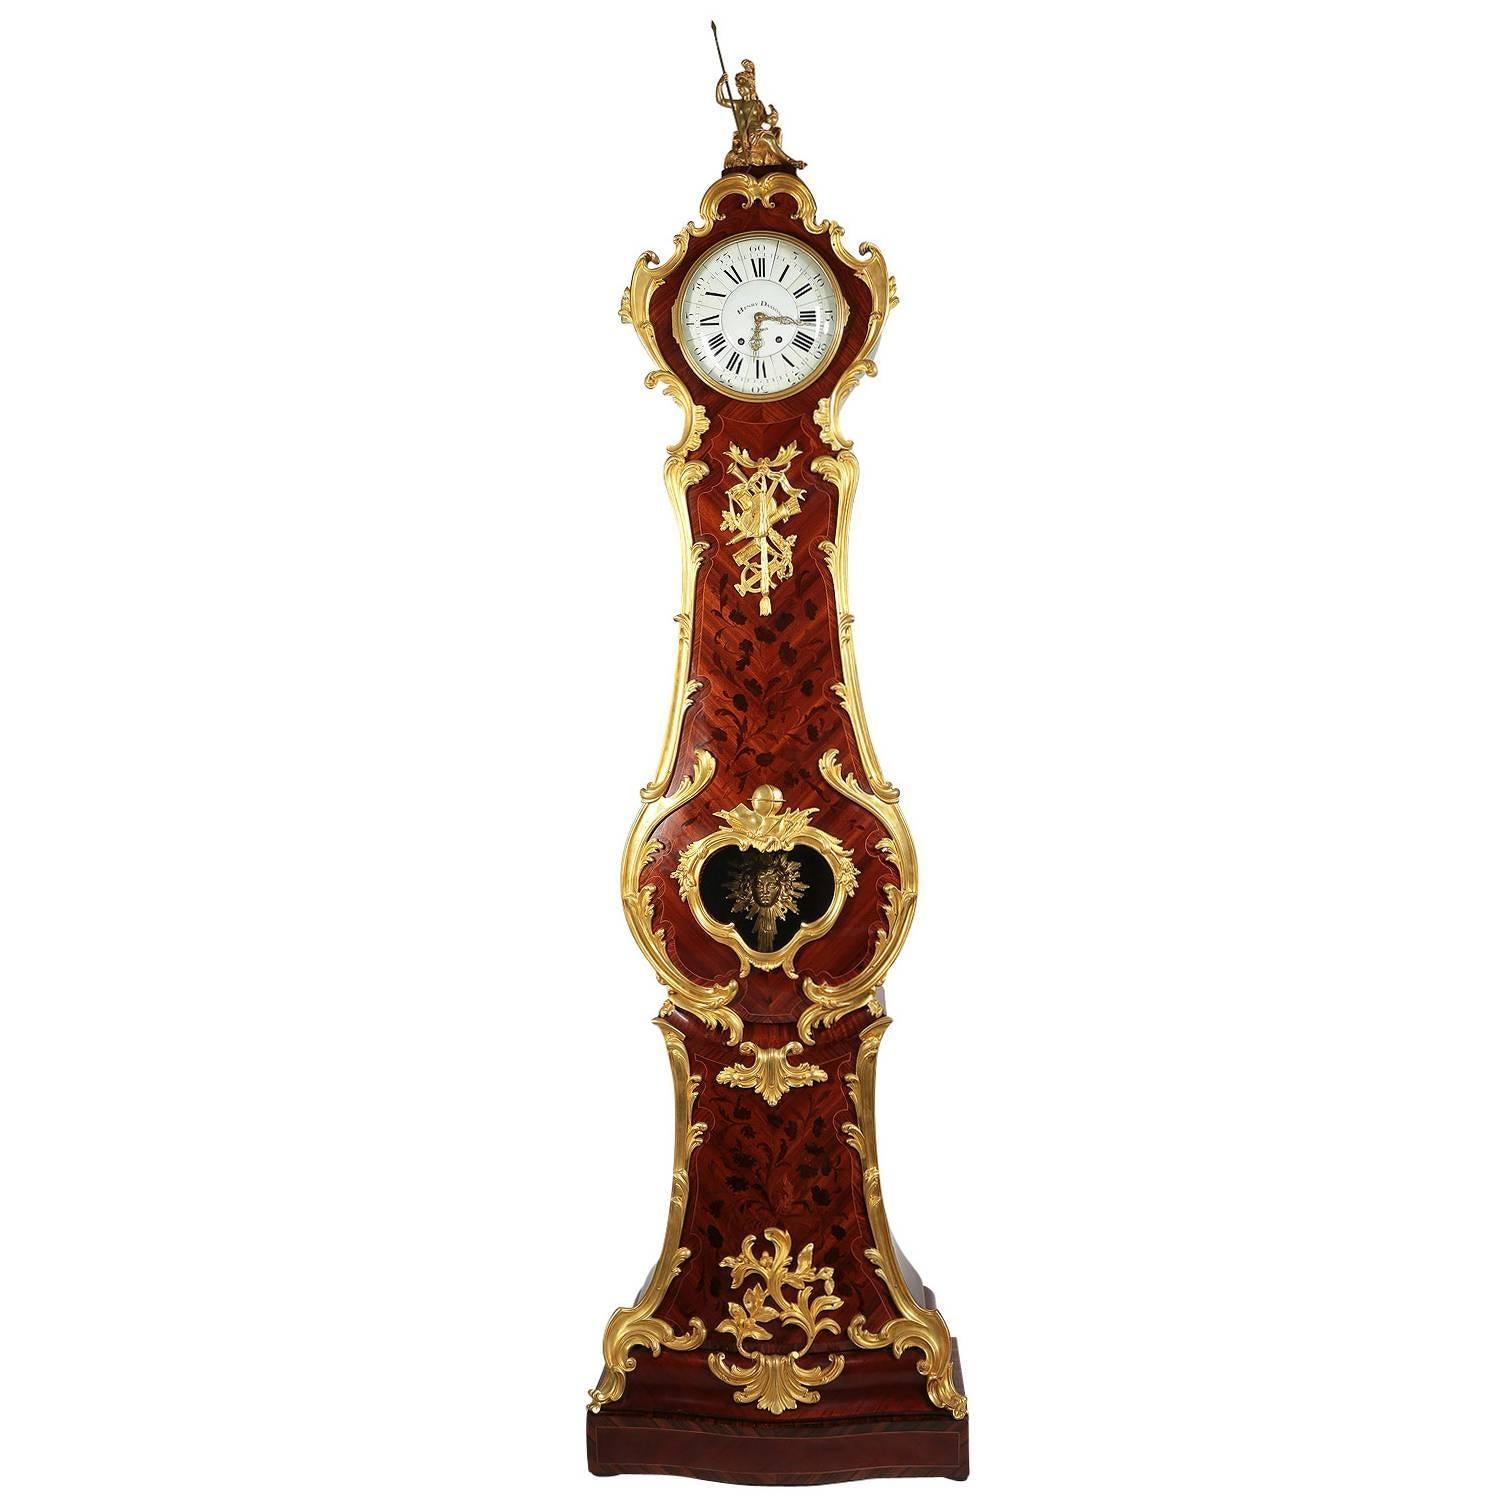 French 19th Century Regence Style Ormolu & Kingwood Grandfather Tall Case Clock